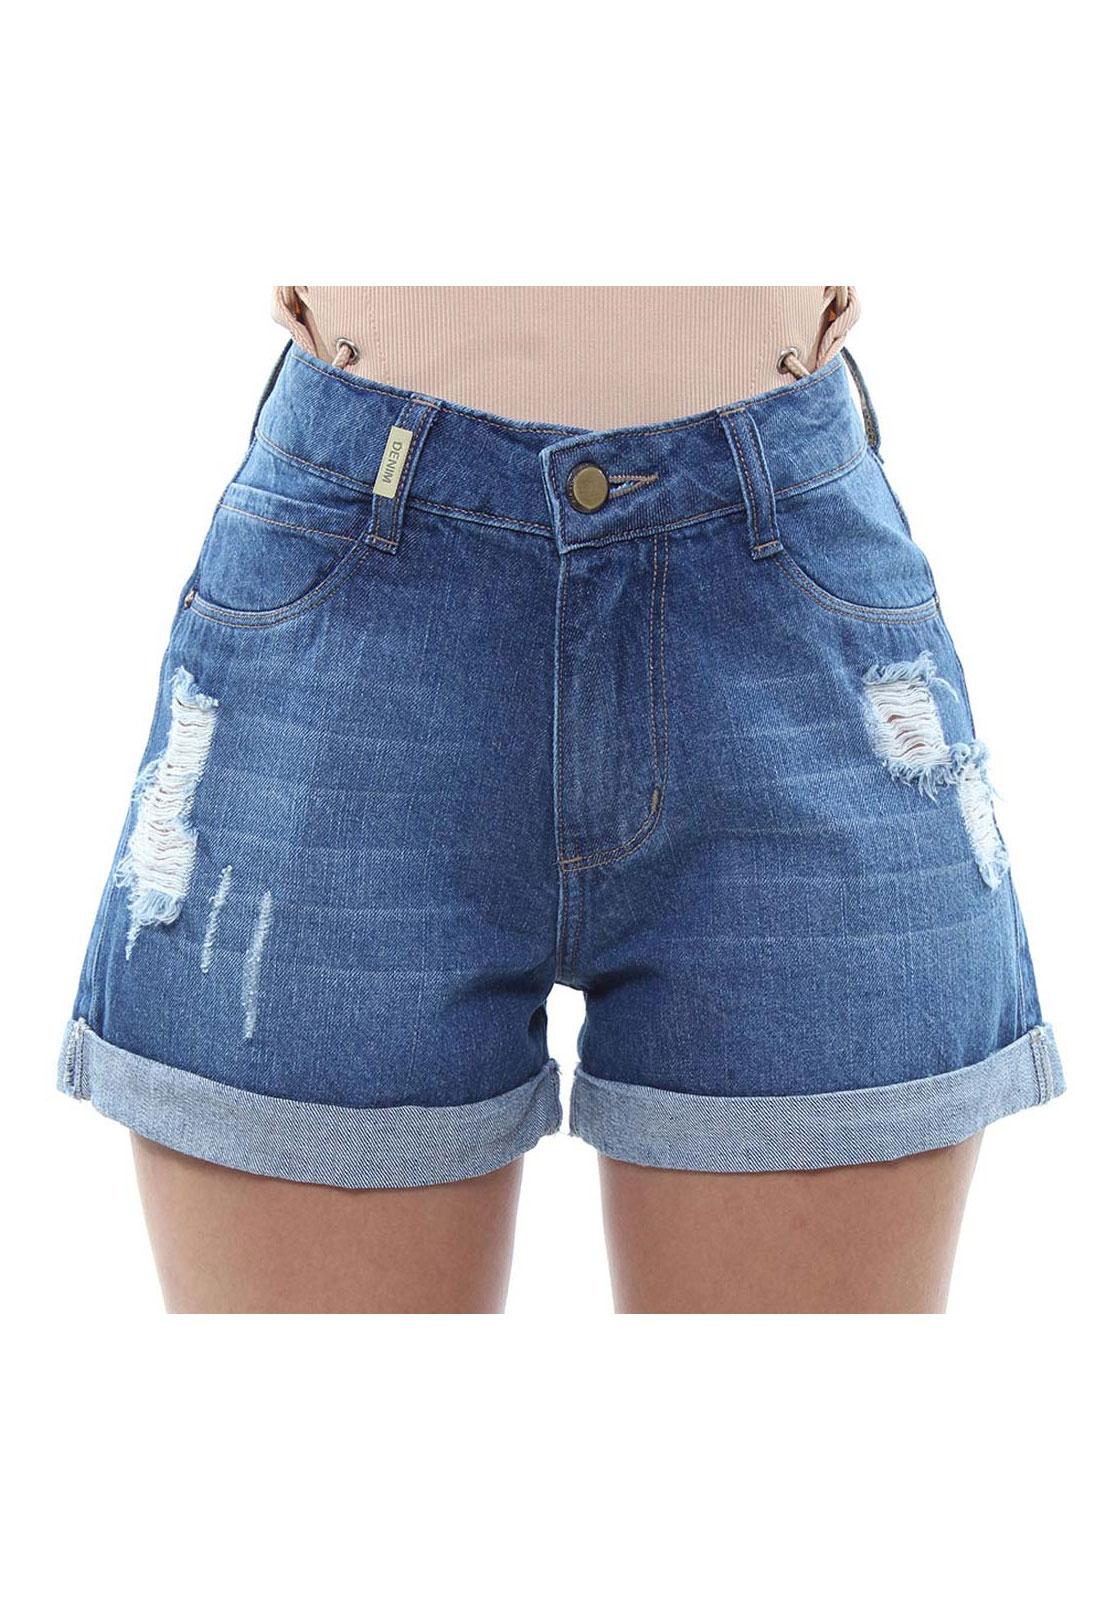 Short Jeans Feminino Curto Destroyed Assimétrico Com Barra Dobrada Crocker - 47921  - CROCKER JEANS